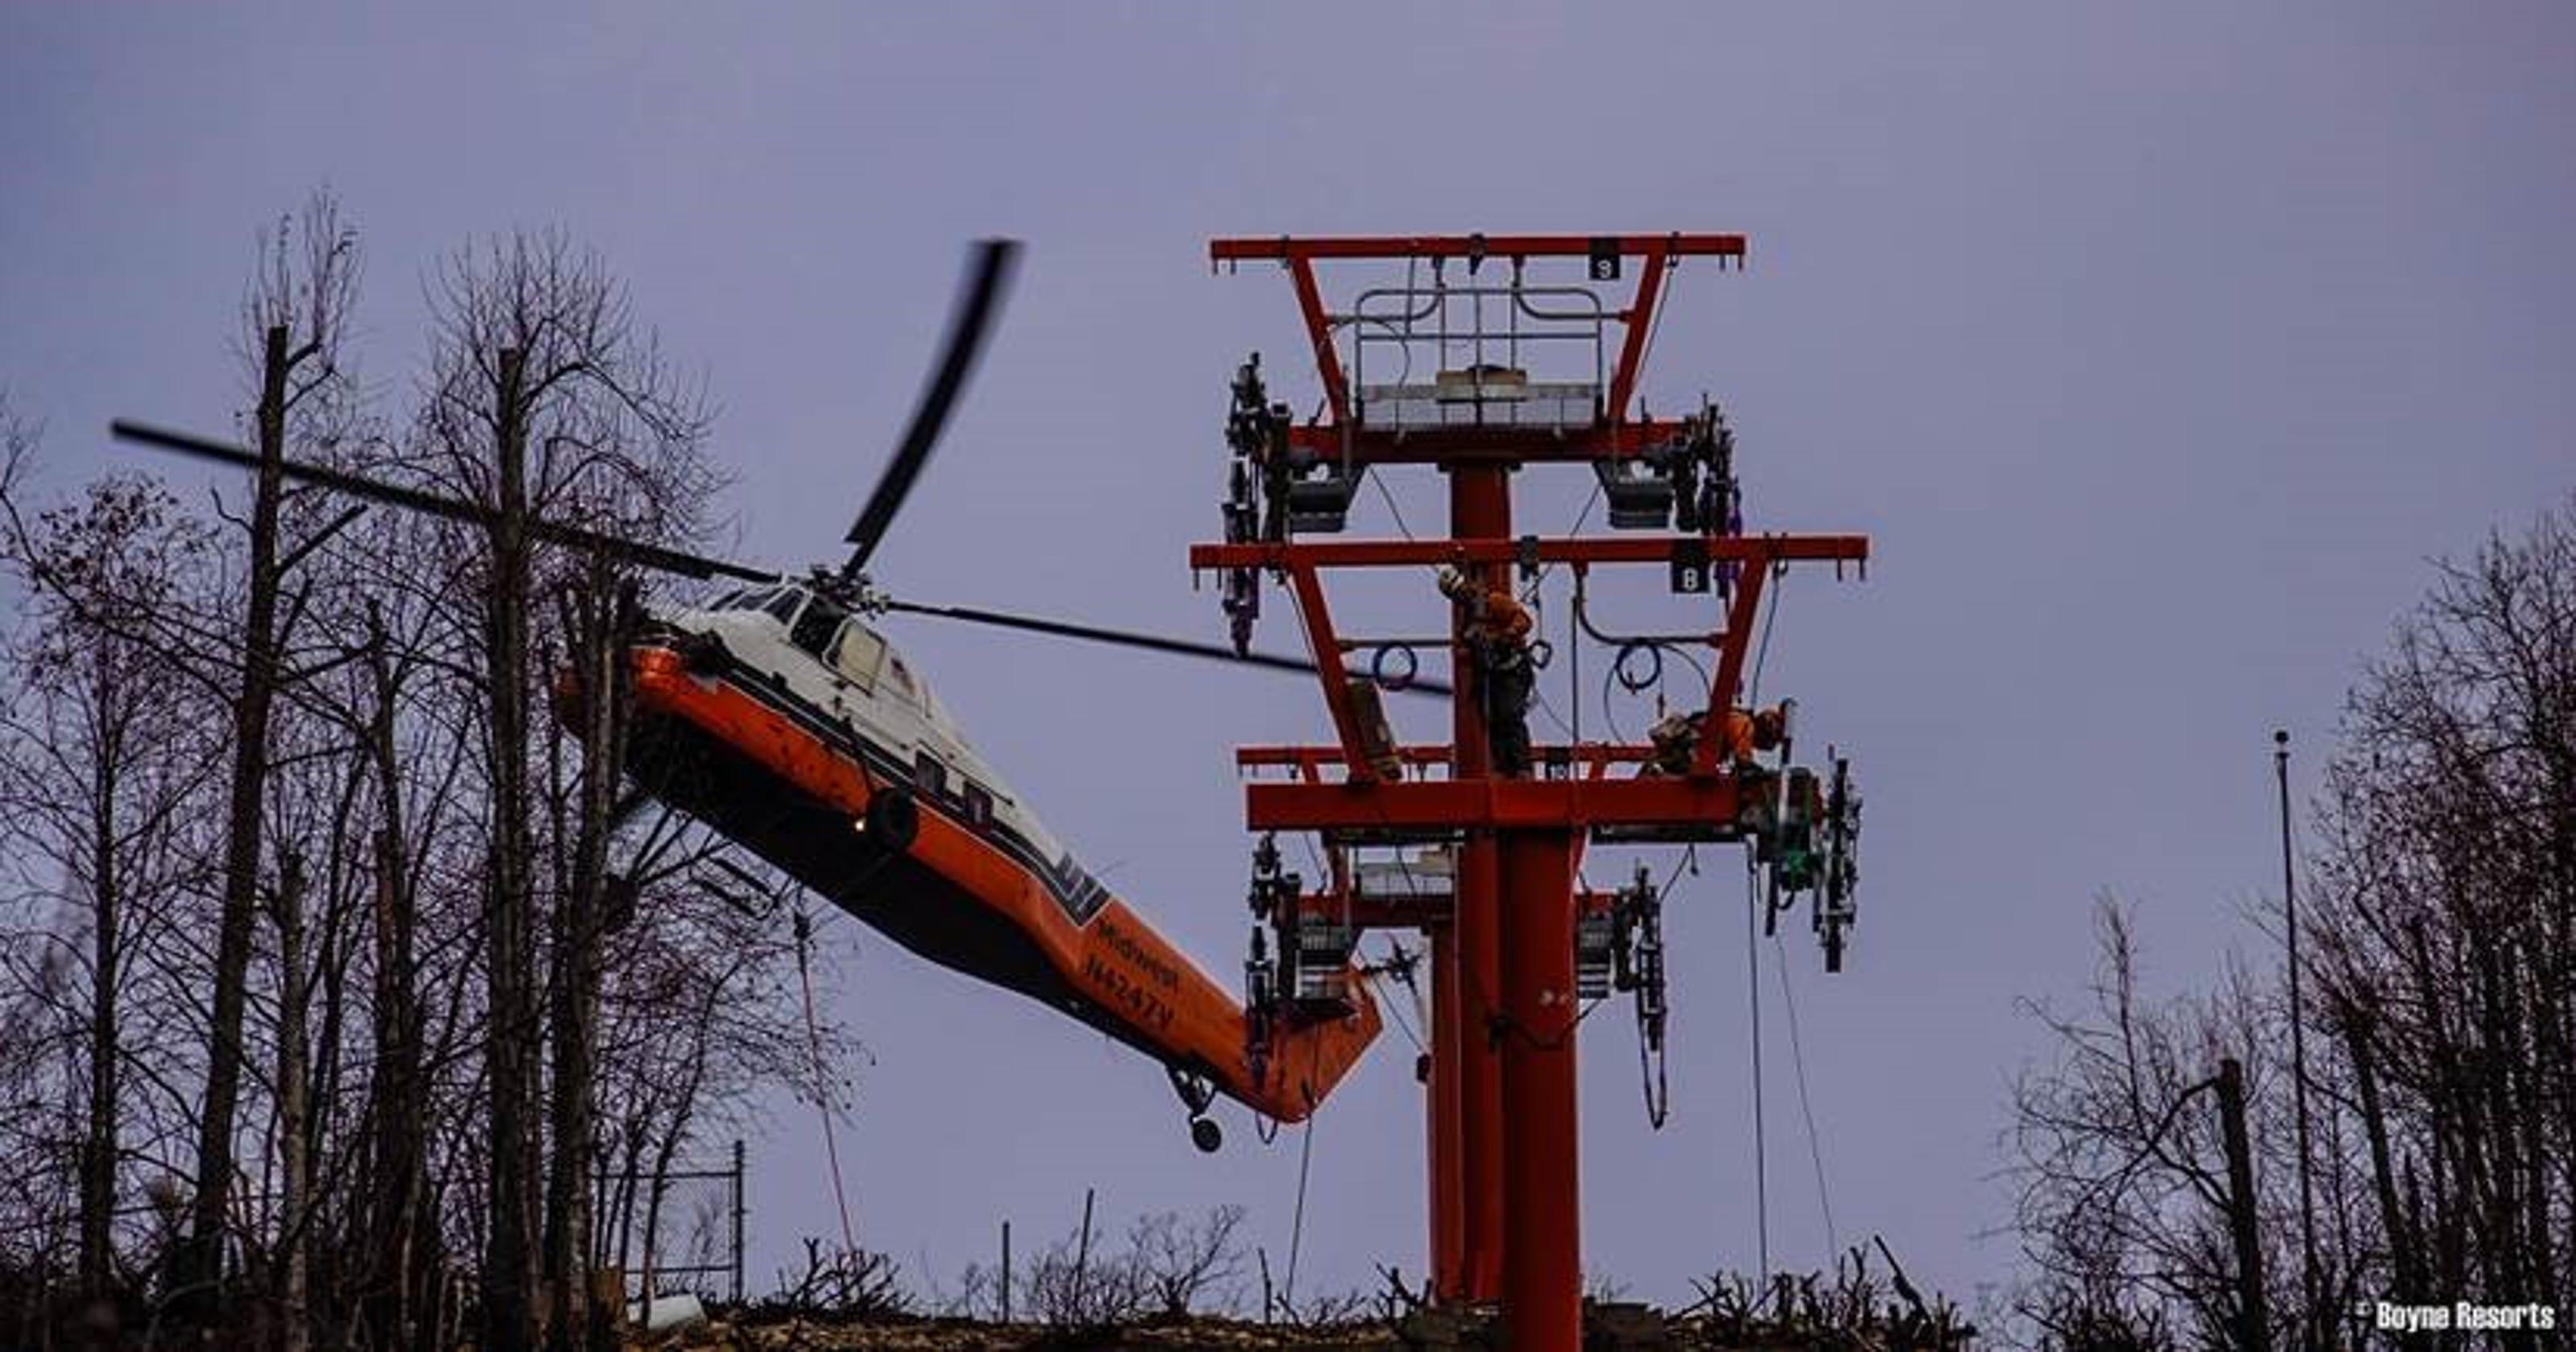 New Sky Lift parts fly into Gatlinburg